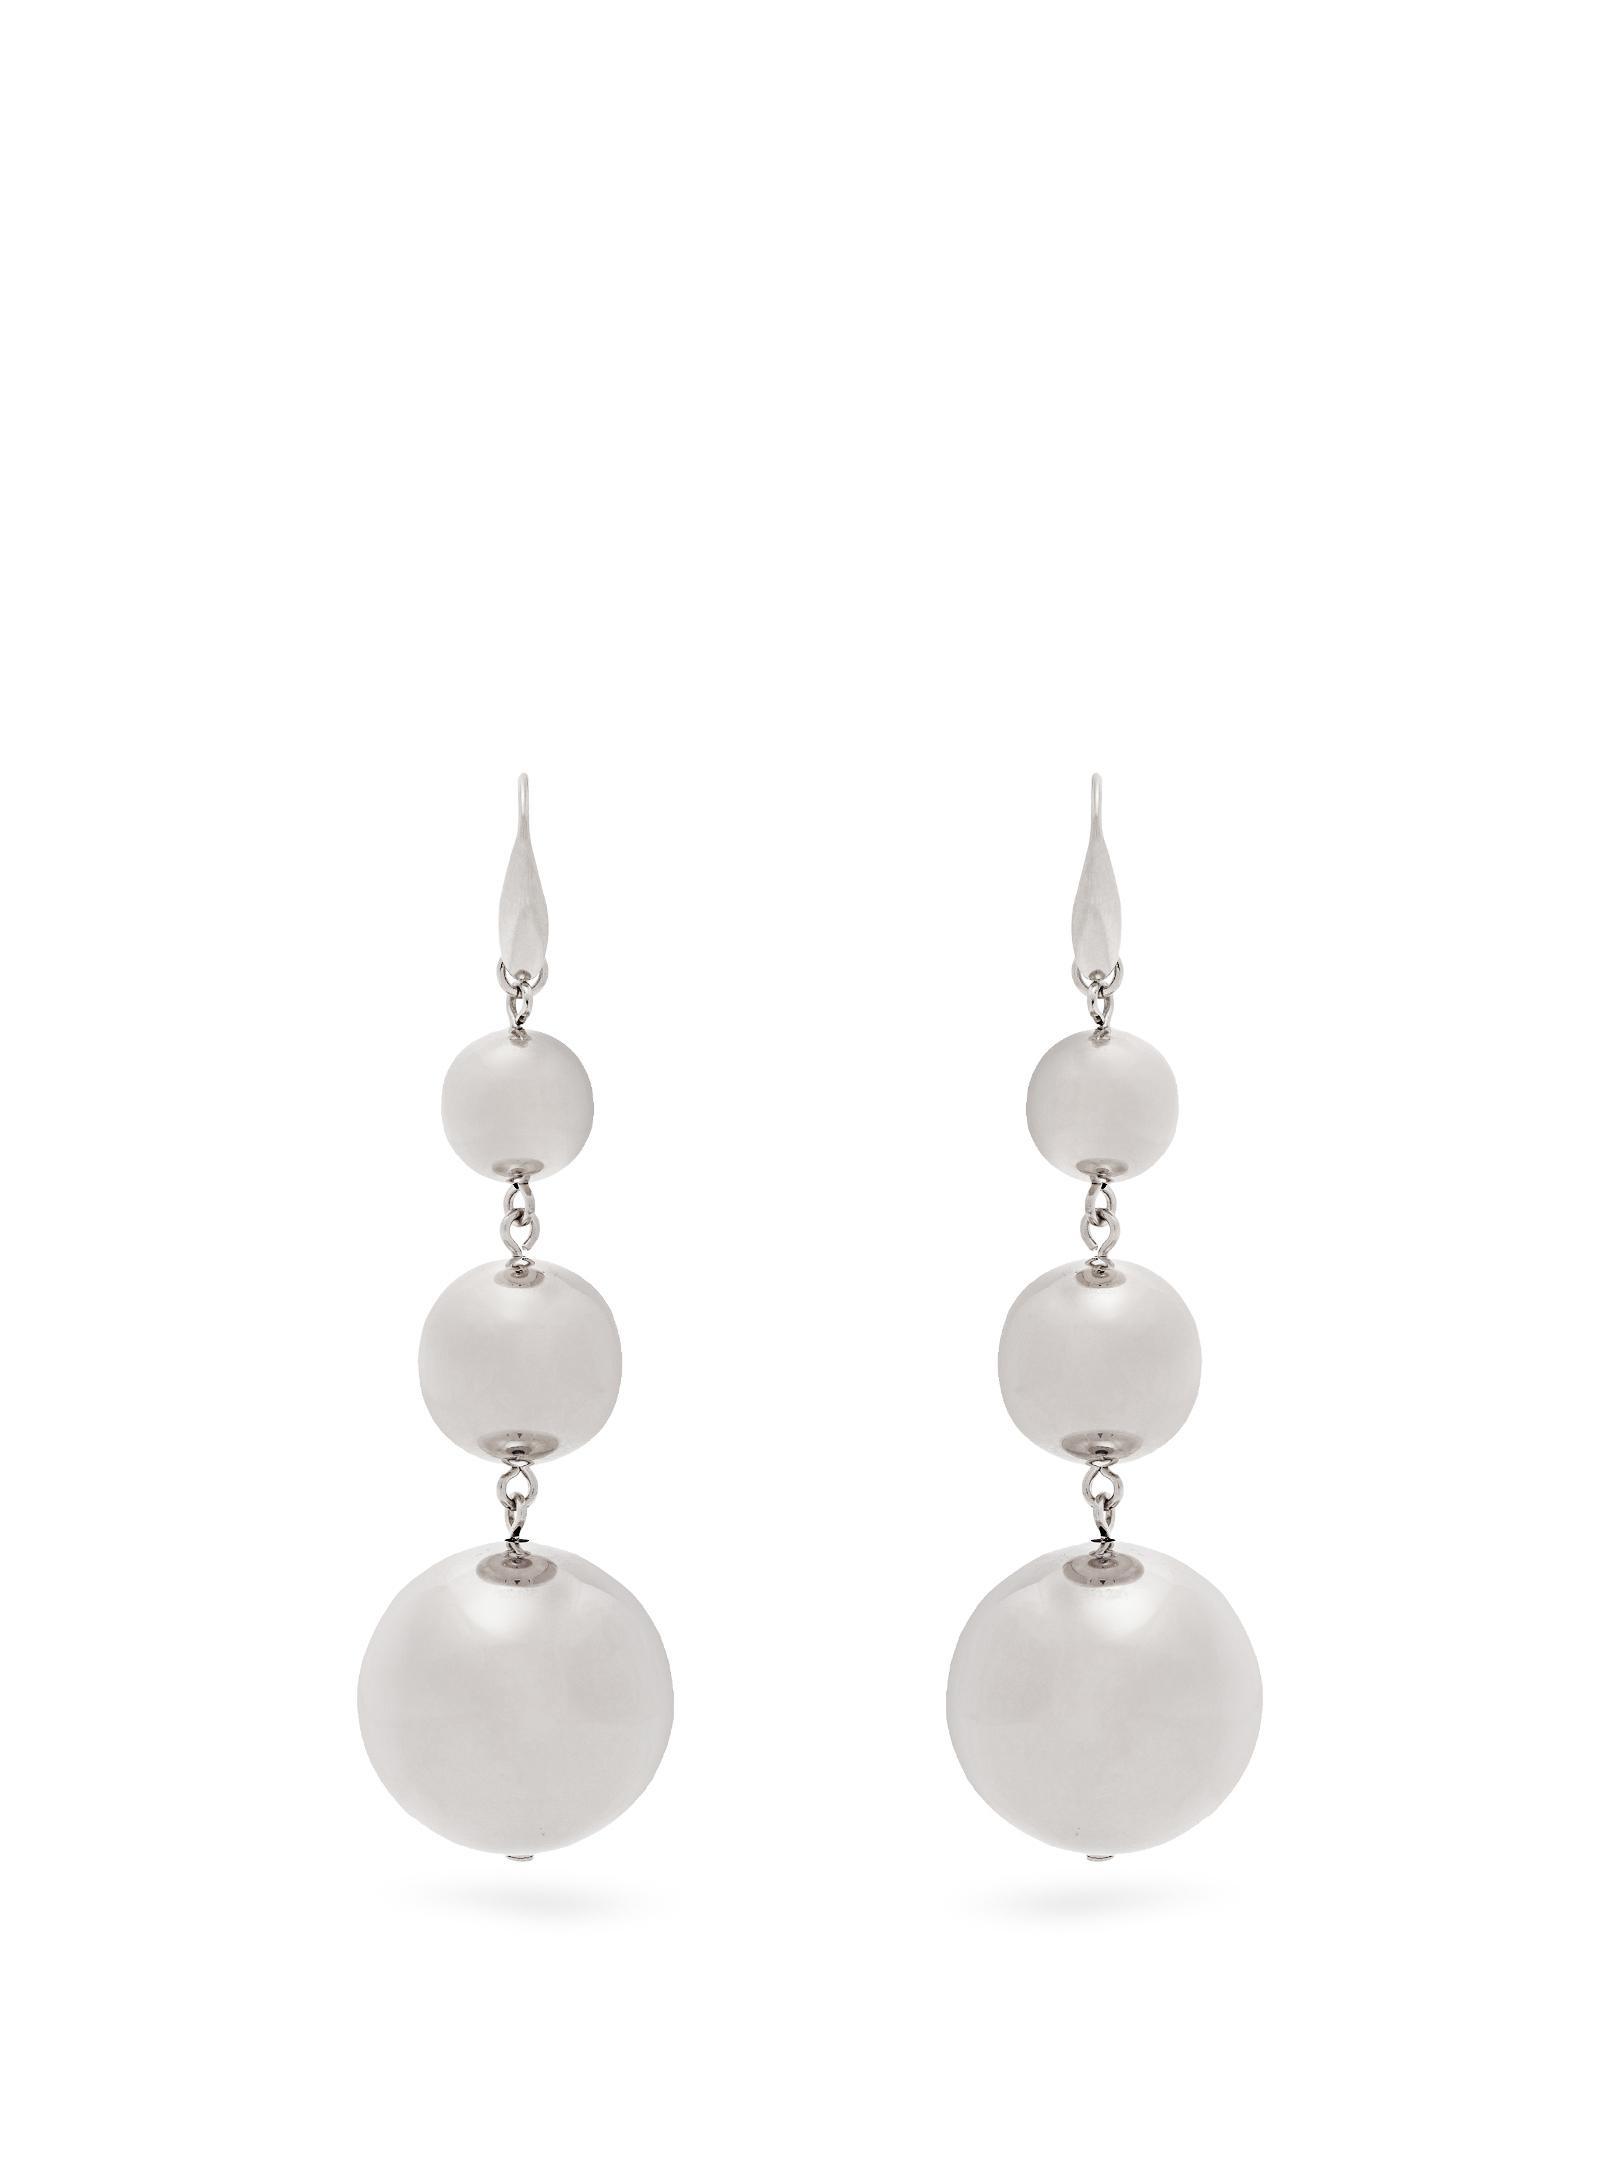 Surpraluminique Earrings Isabel Marant Lm5nVGAl4